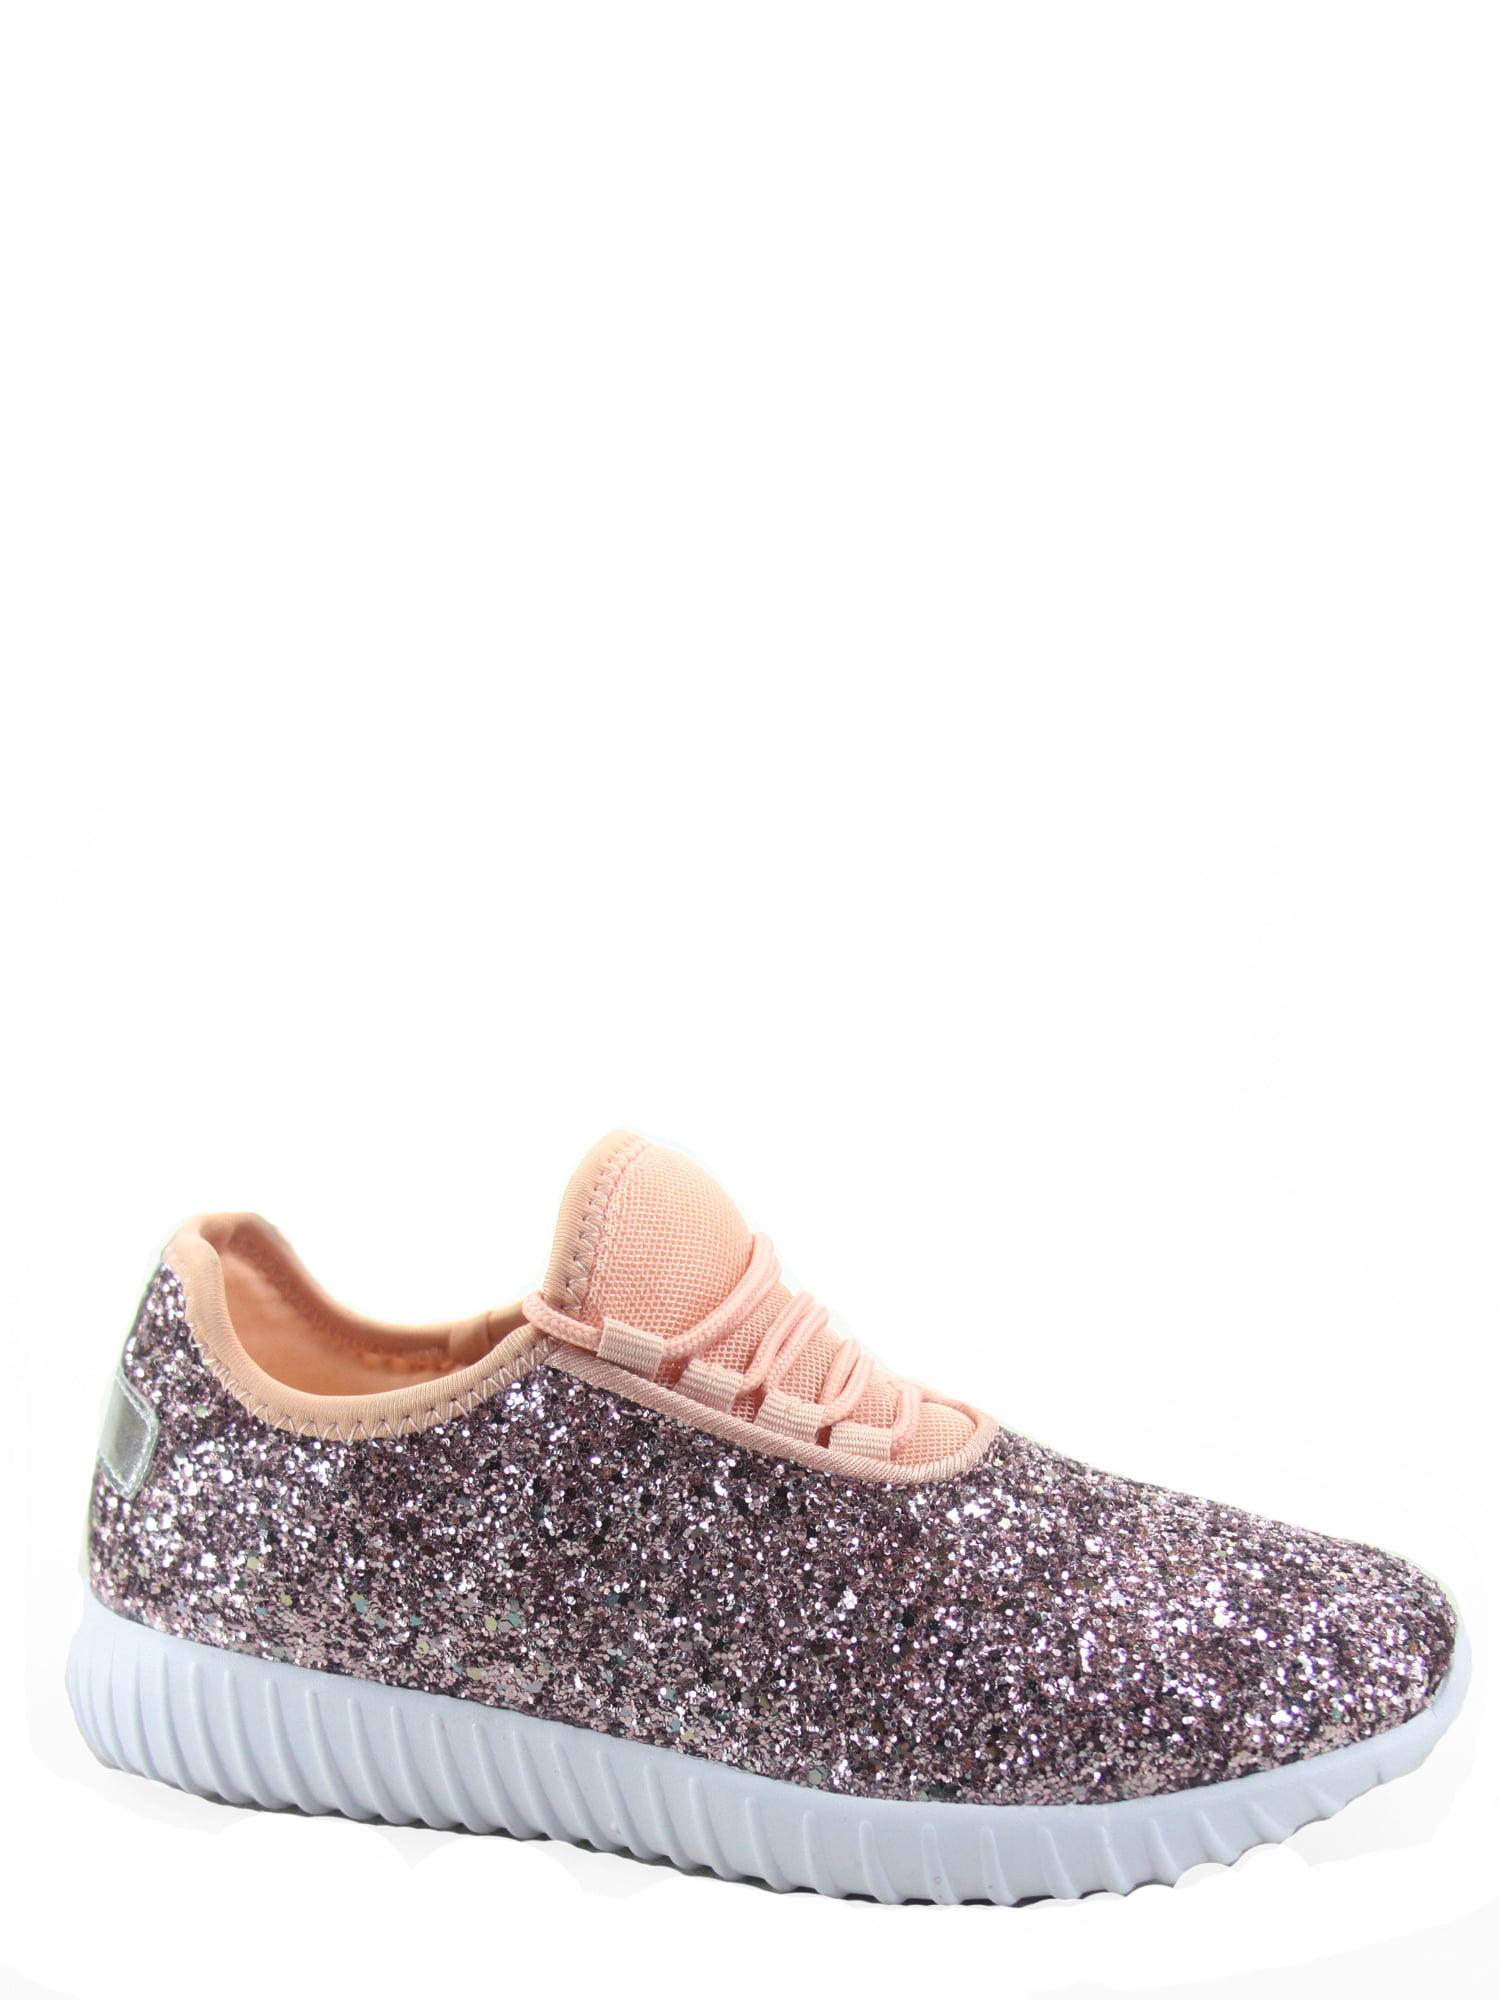 remy glitter sneakers